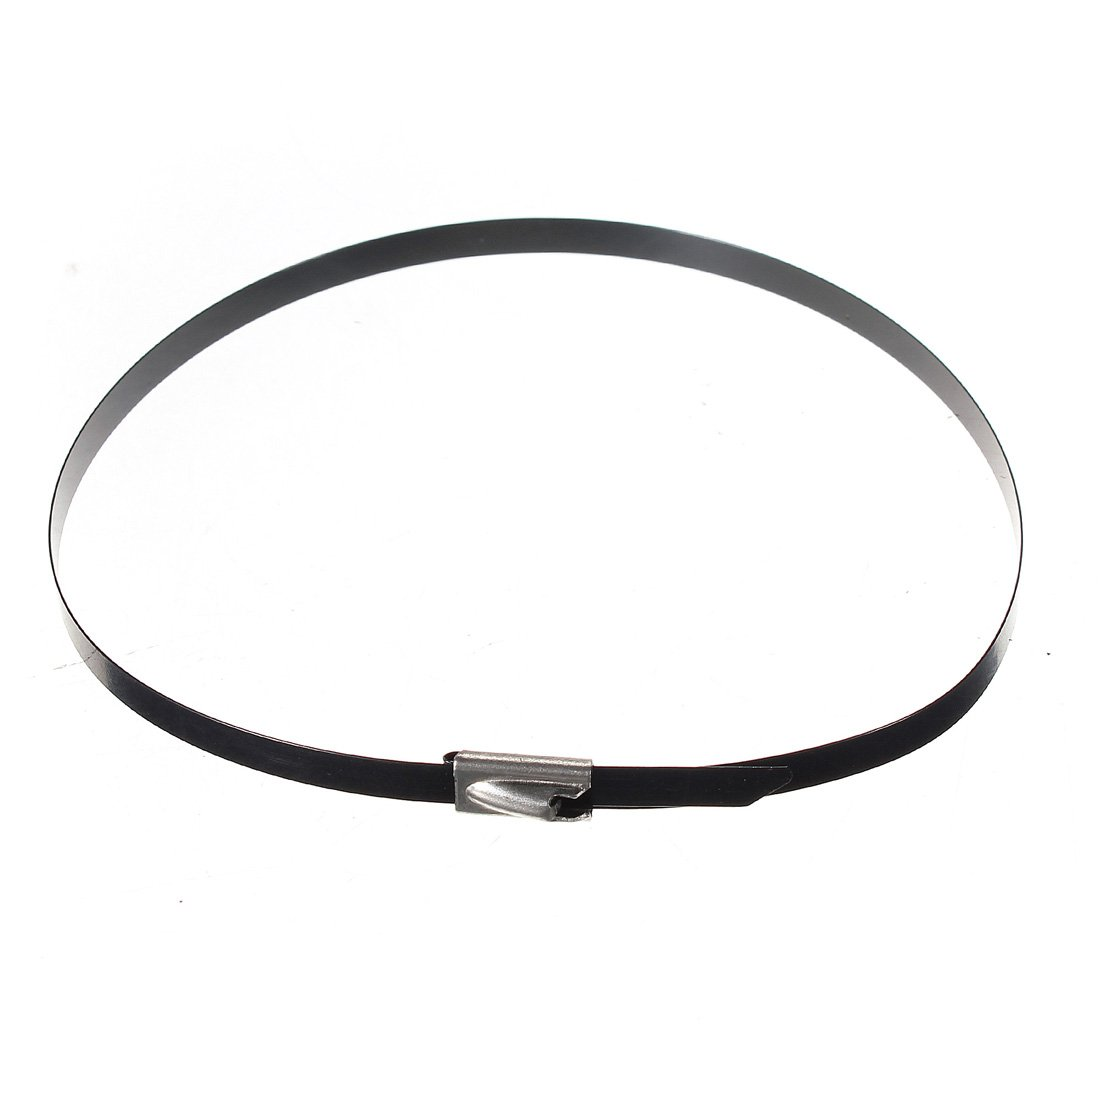 100 Edelstahl Kabelbinder Metallkabelbinder Kabel Binder 300mm X 4,6mm Kabelband